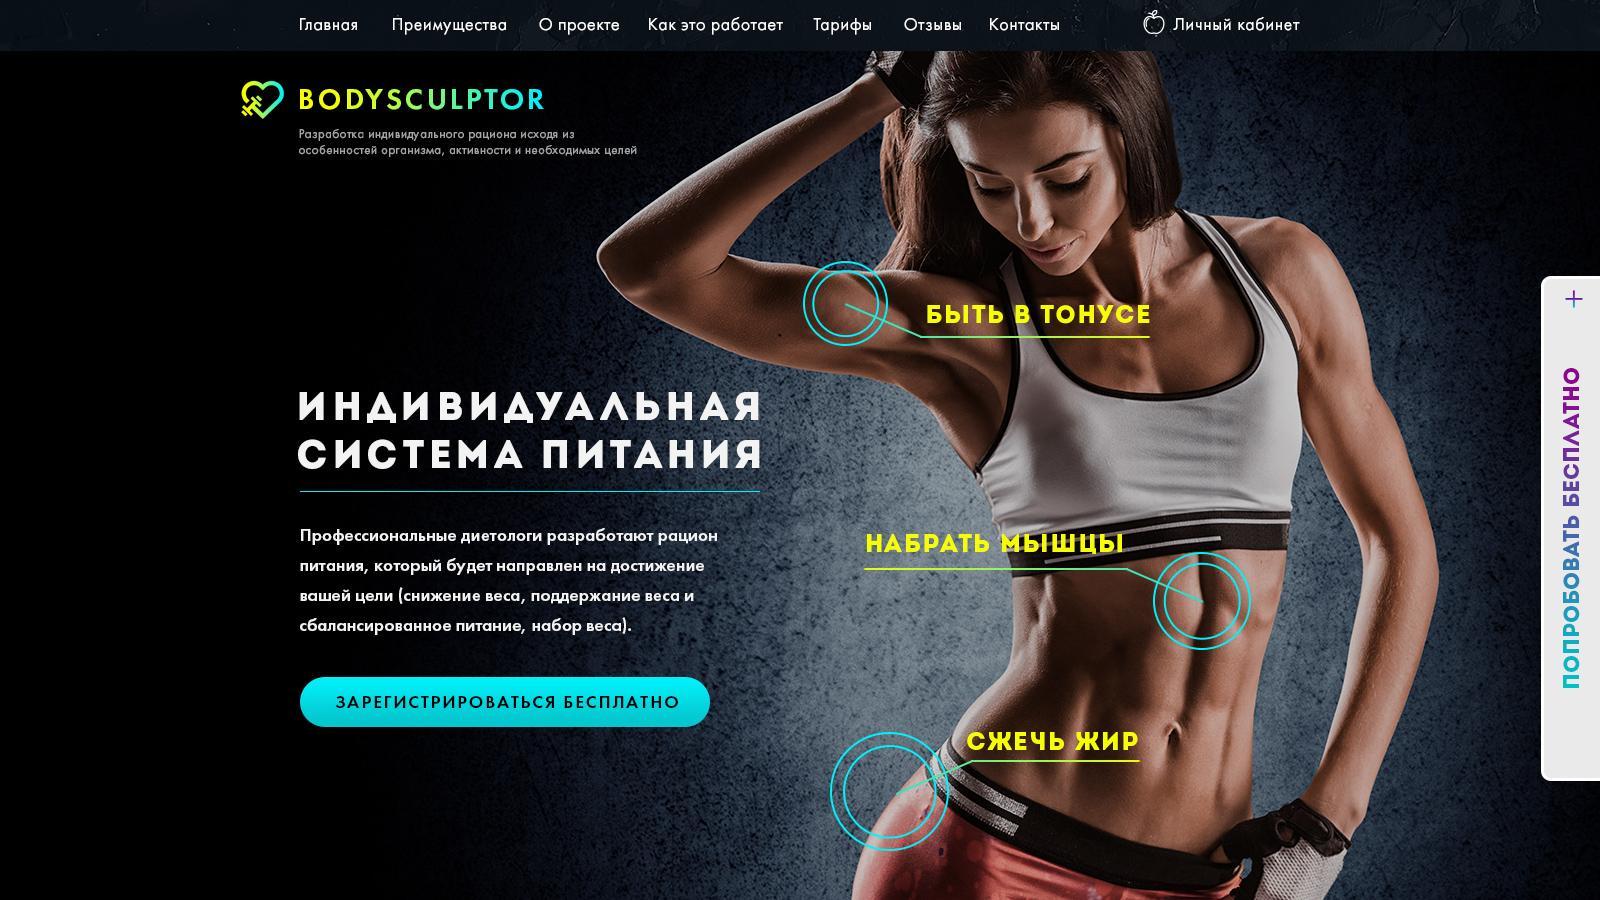 bodysculptor